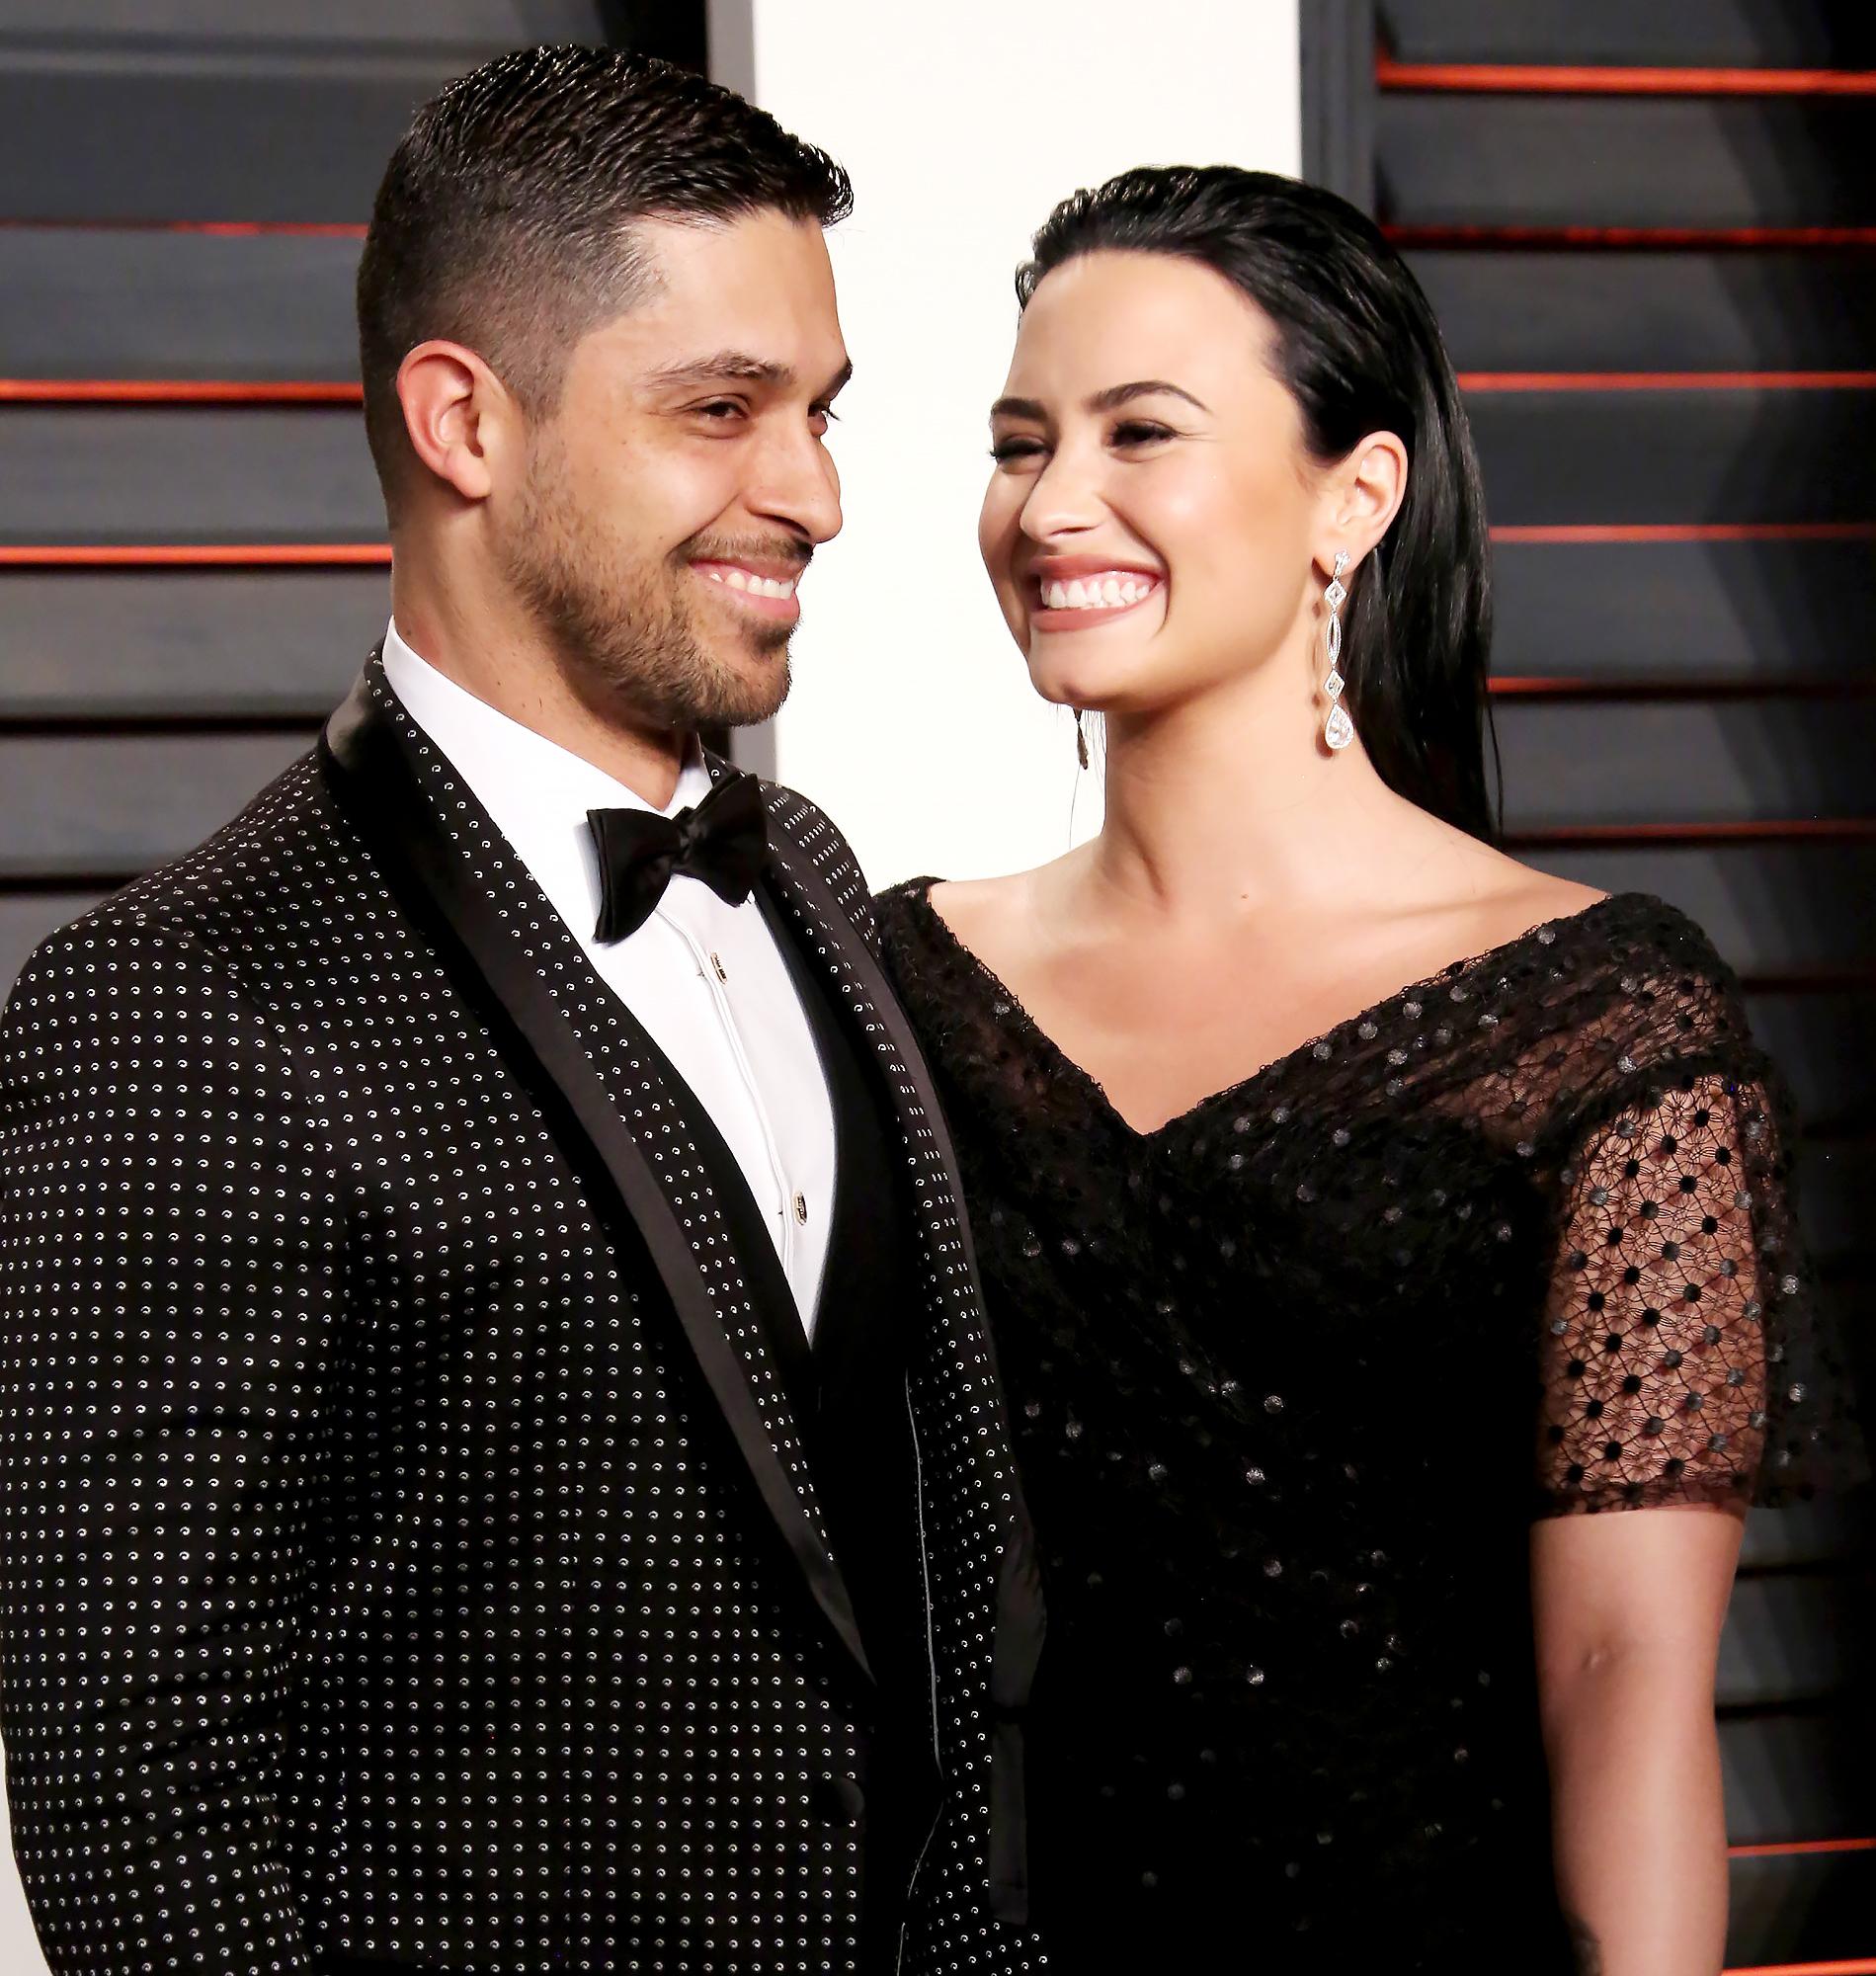 Demi Lovato Reacts to Ex Wilmer Valderrama Engagement